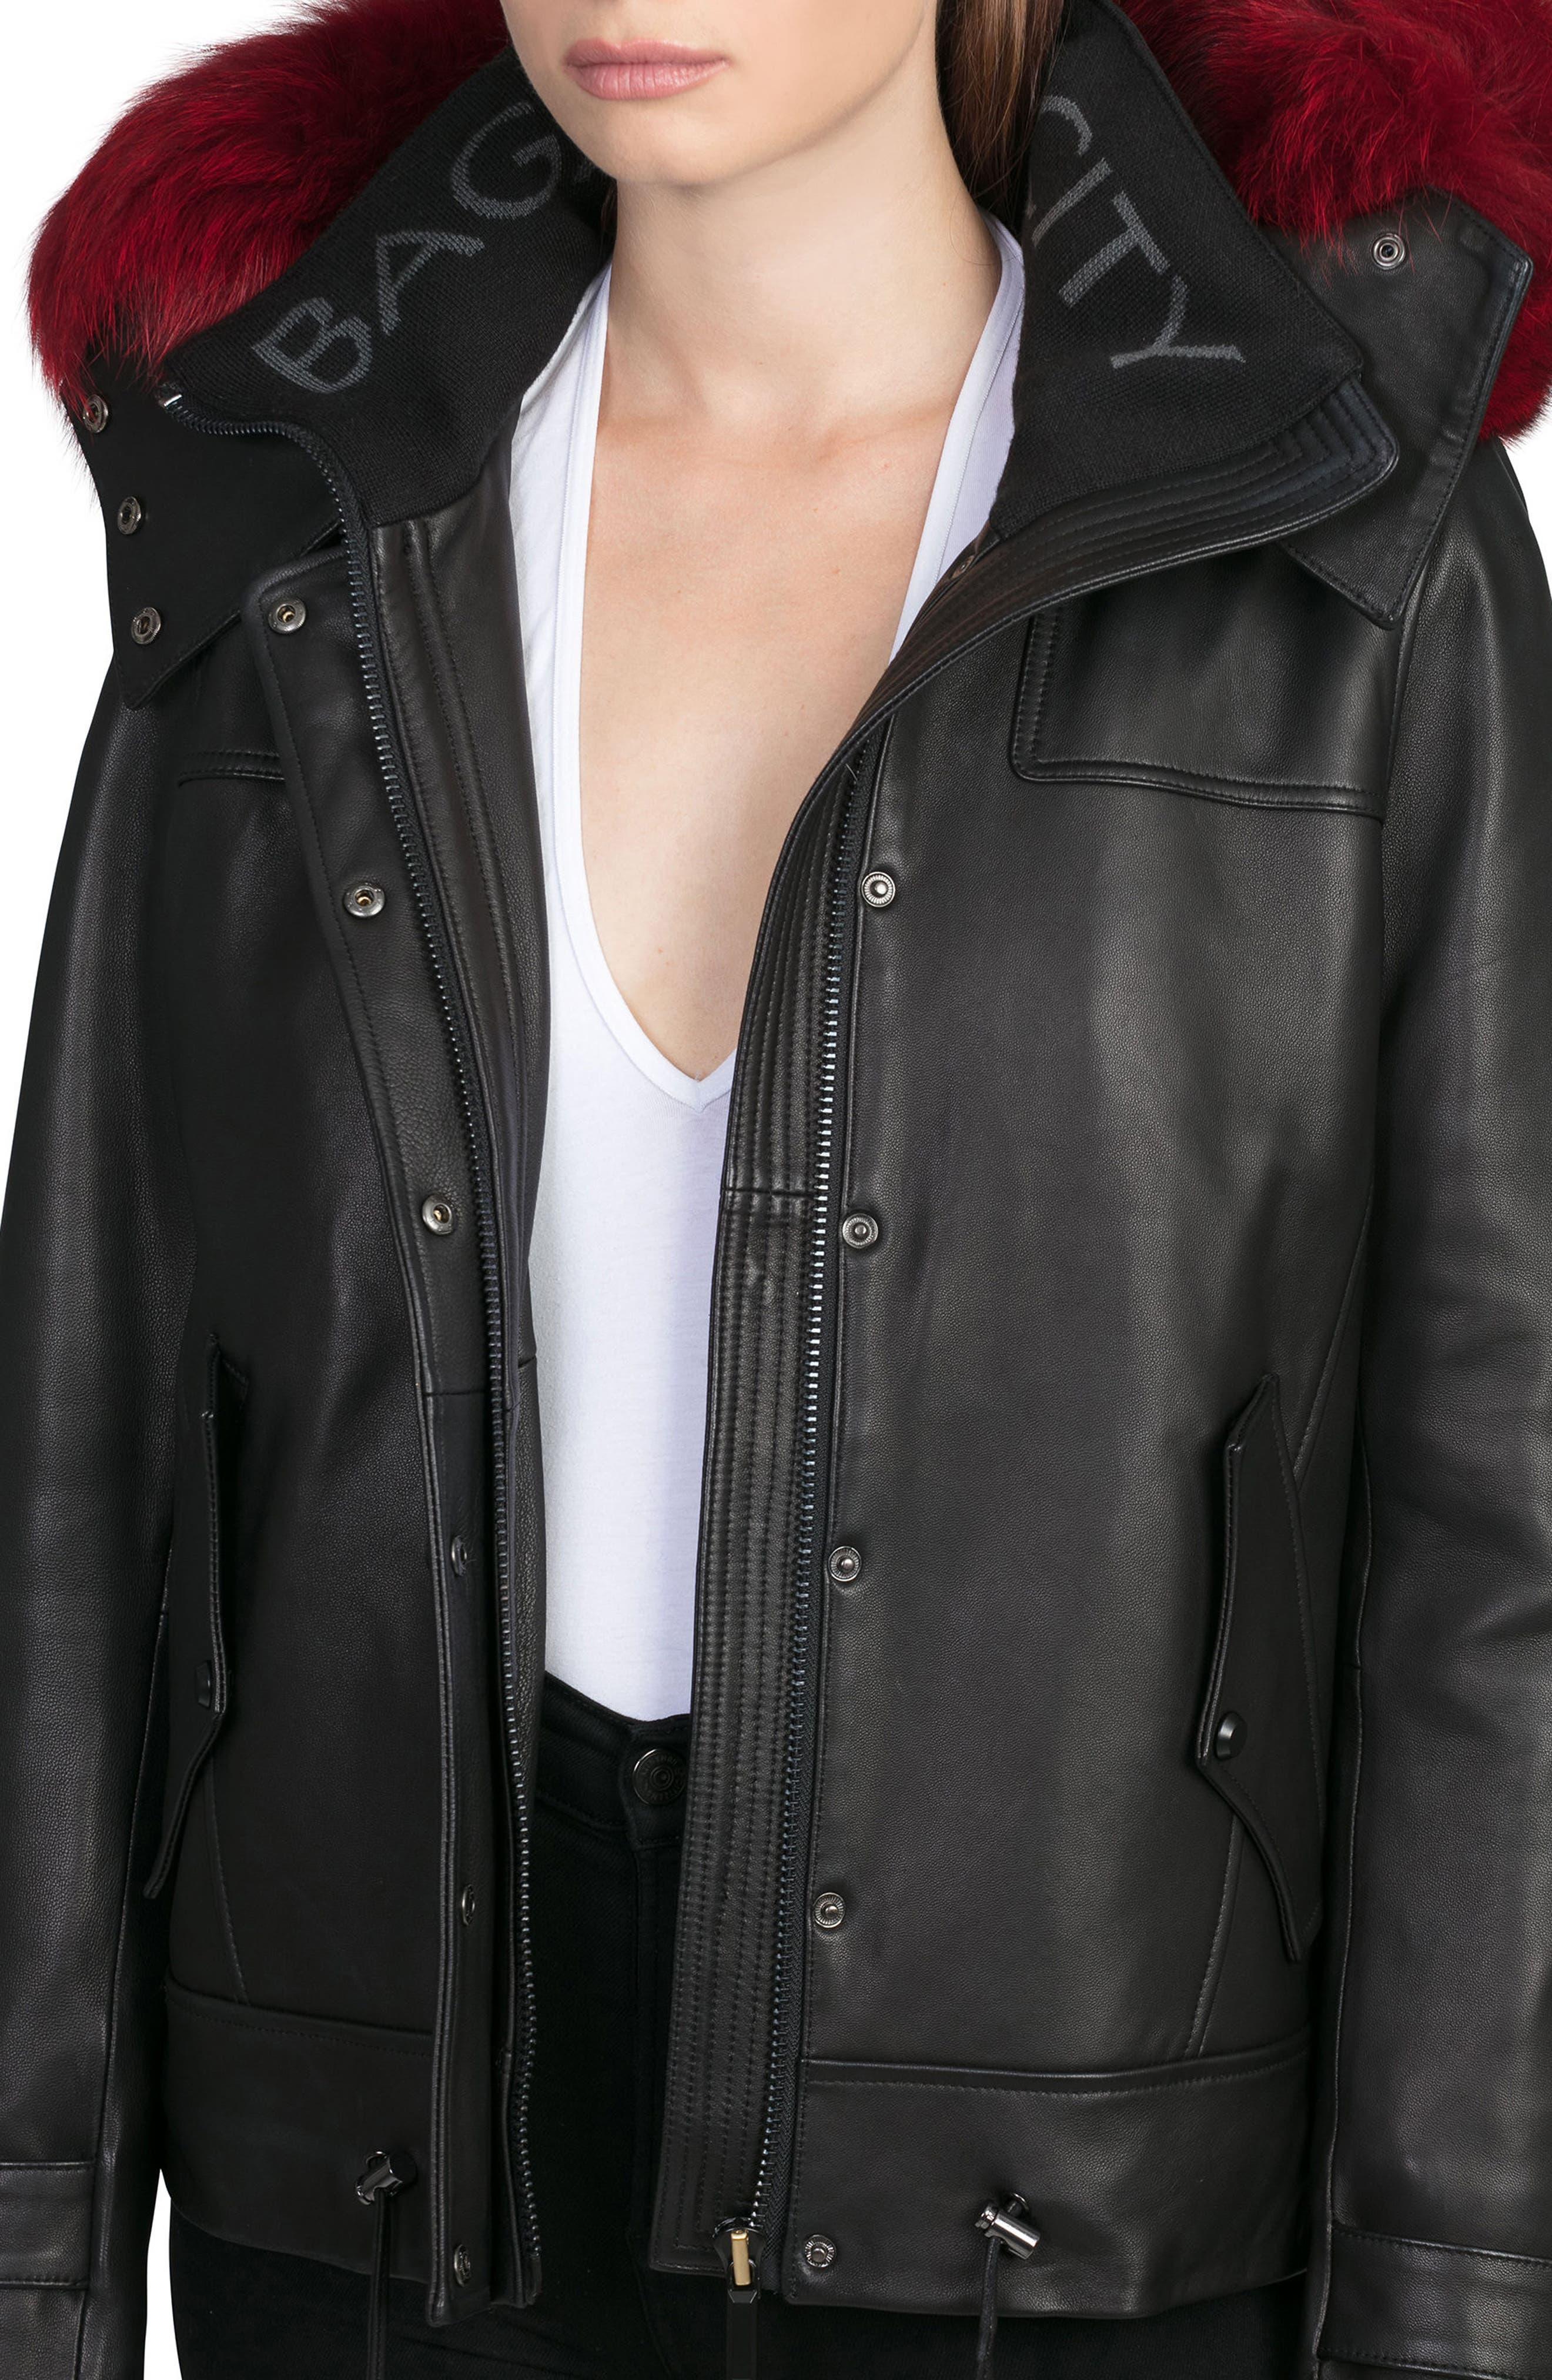 BAGATELLE.CITY The Aspen Leather Jacket with Genuine Fox Fur Trim,                             Alternate thumbnail 5, color,                             001